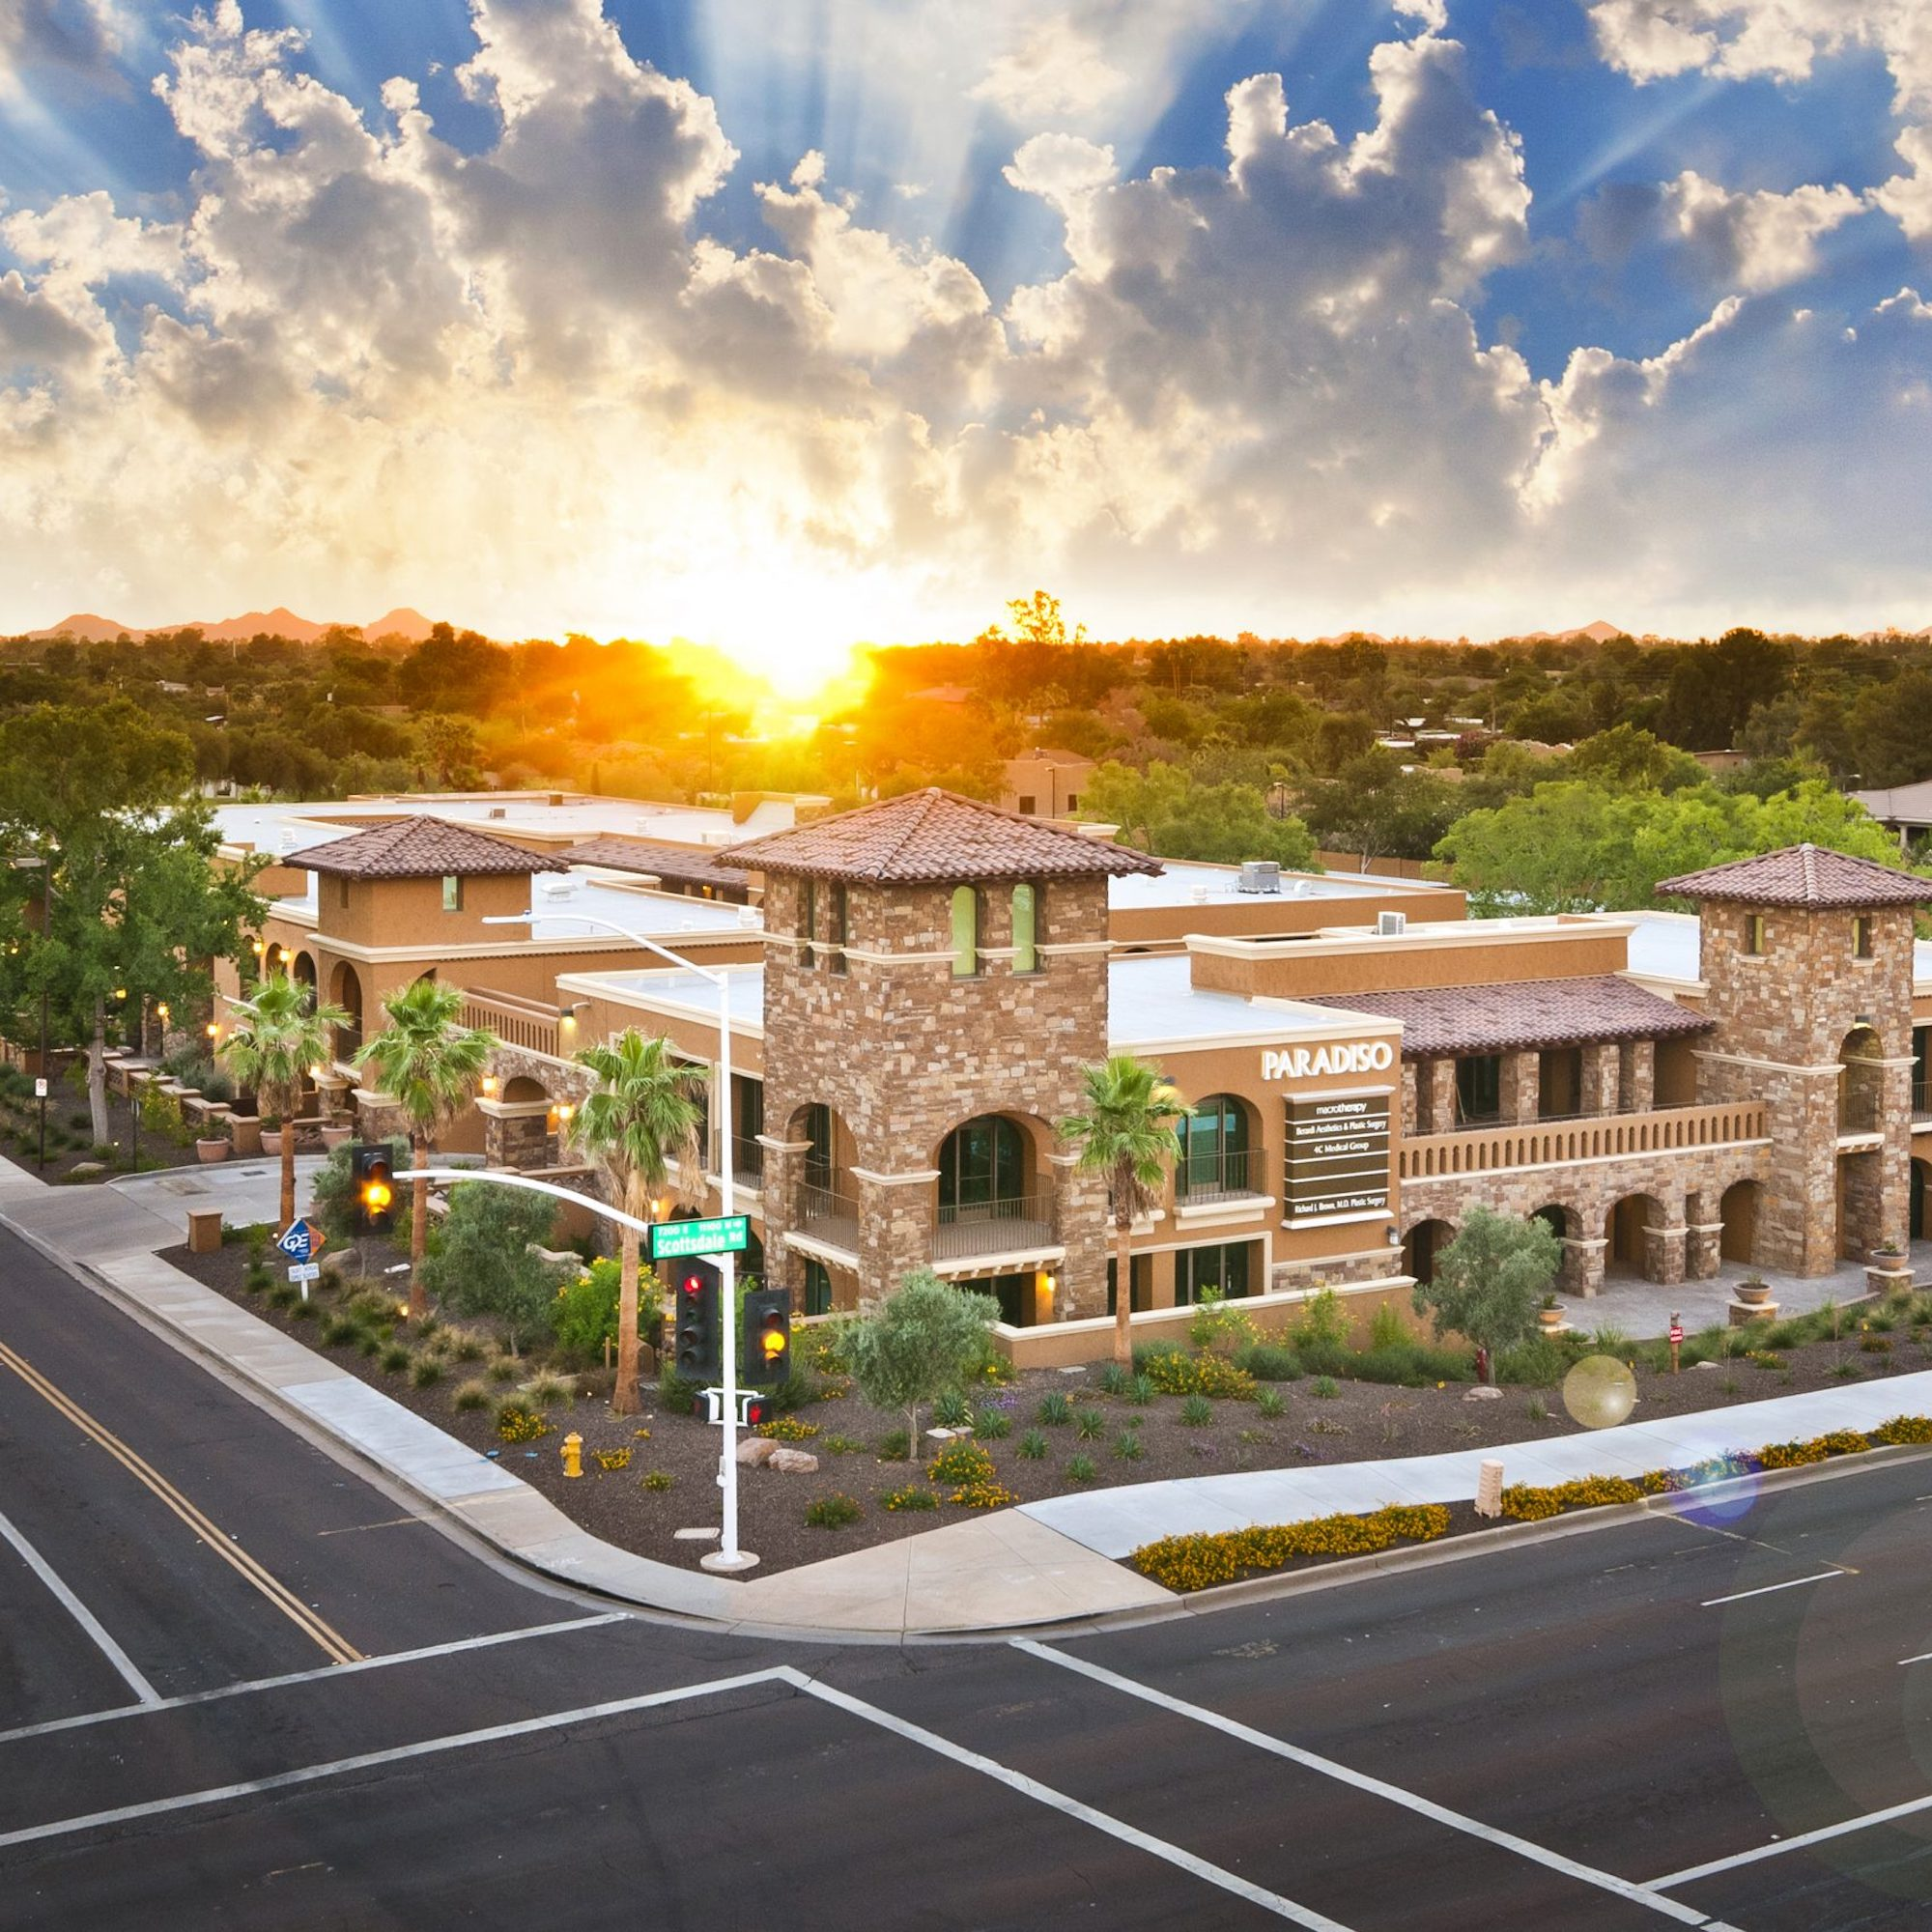 Alternative Cancer Treatment Center in Scottsdale, Arizona